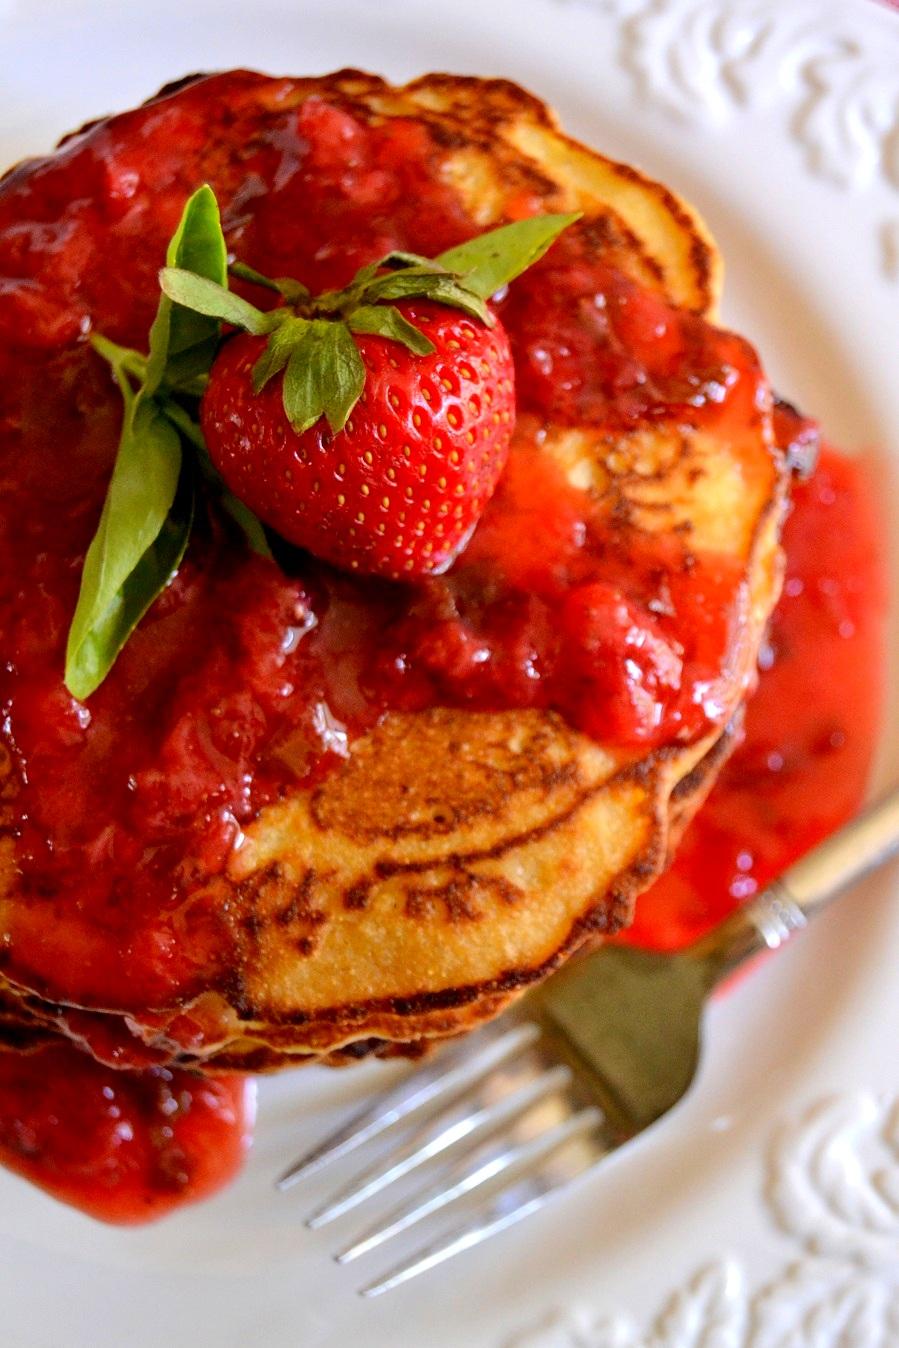 Cornmeal Pancakes with Strawberry Basil Syrup